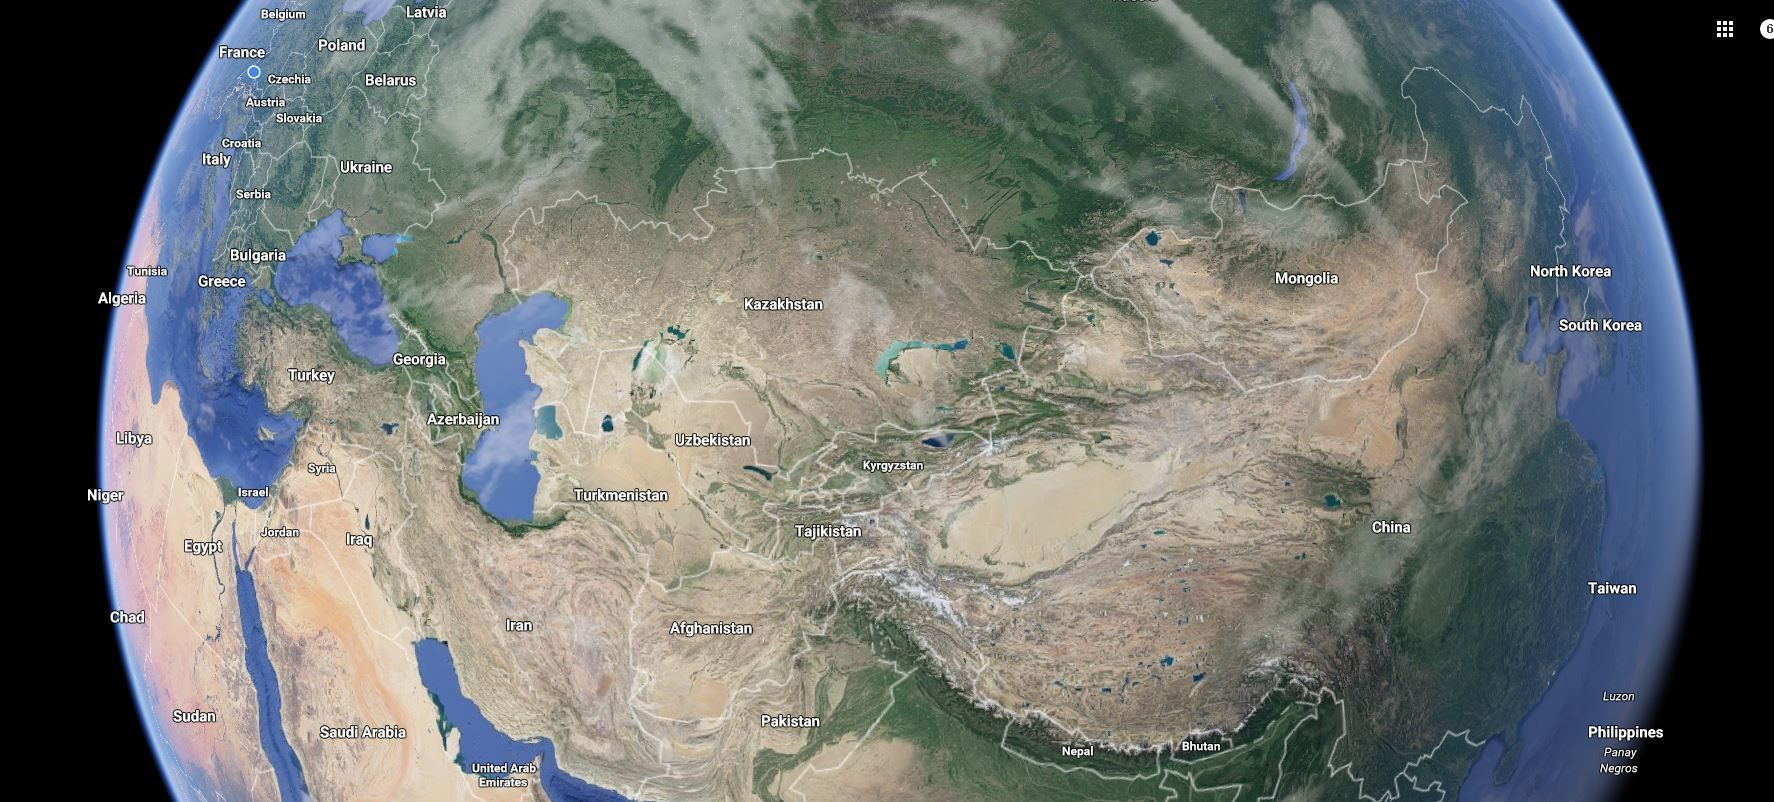 Kyrgyzstan on the google world map